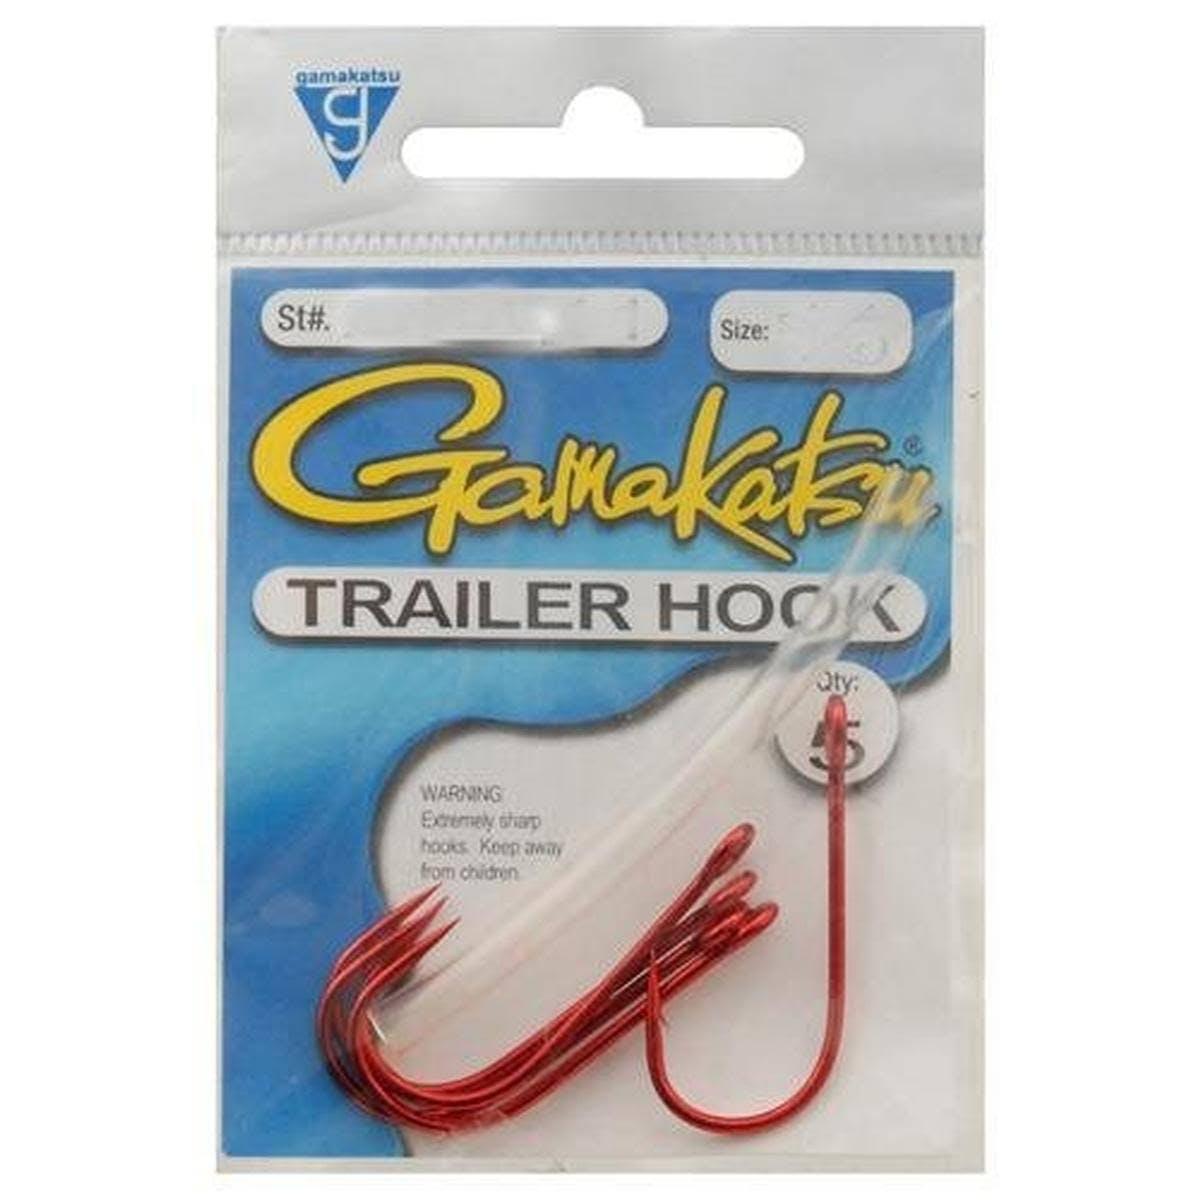 Gamakatsu Trailer Hook - Red 1/0